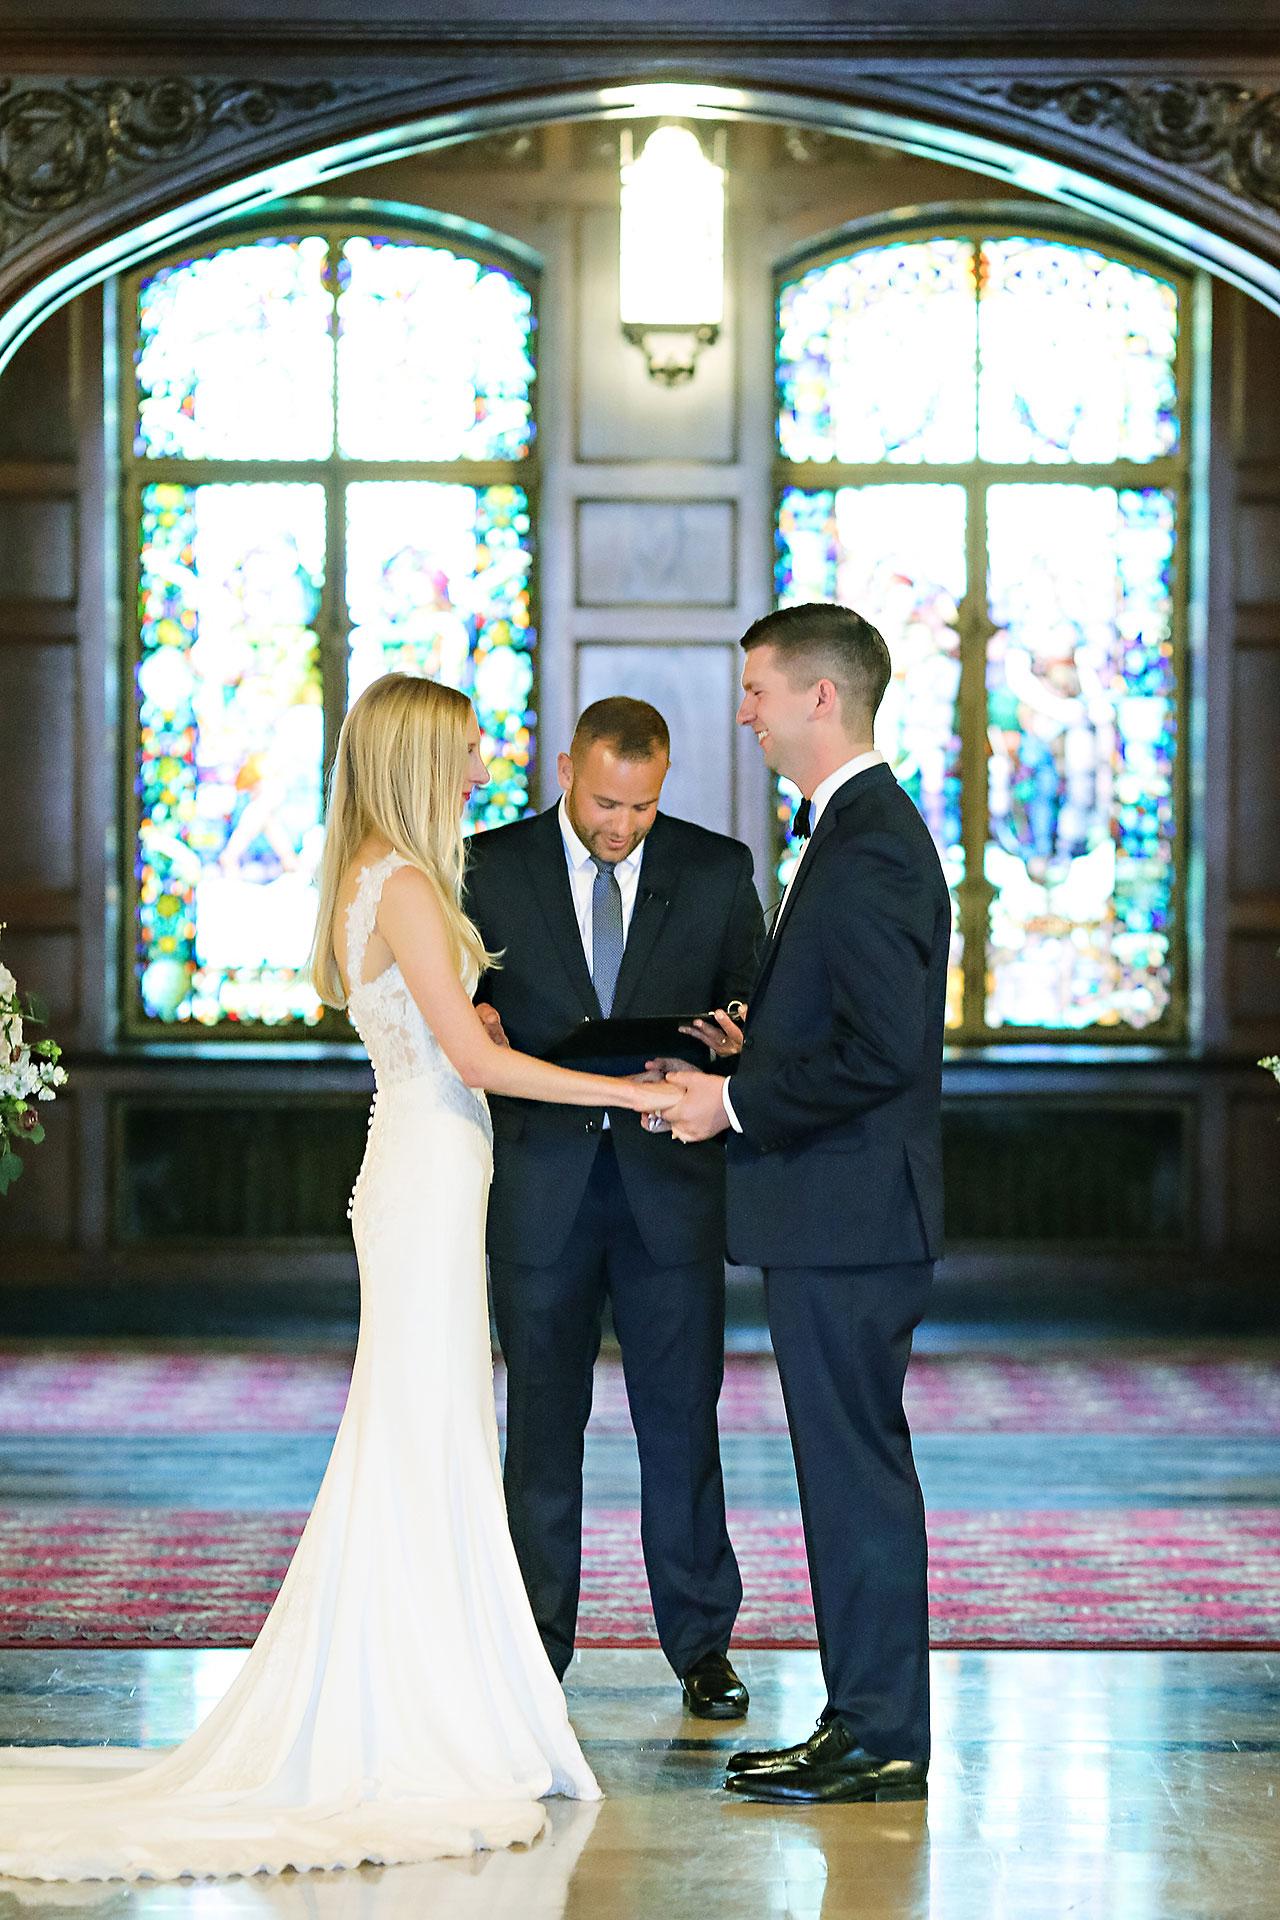 Molly Declan Scottish Rite Indianapolis Wedding 127